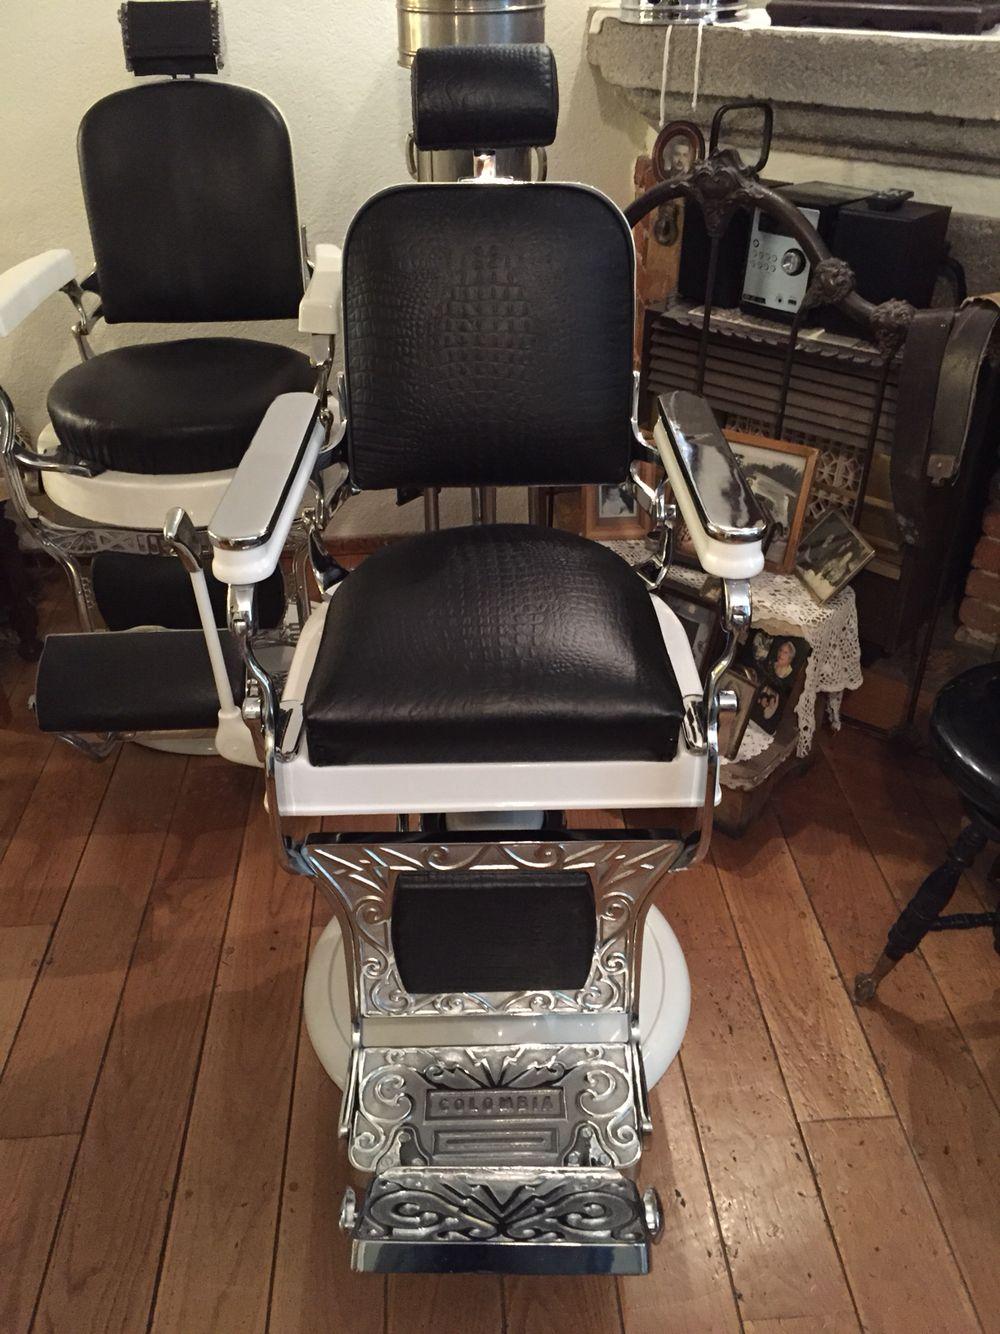 Antique barber chairs koken - En Venta Silla De Barbero Marca Colombia De 1943 Totalmente Restaurada Ideal Para Decoraci N O Barberia Barber Chairsome